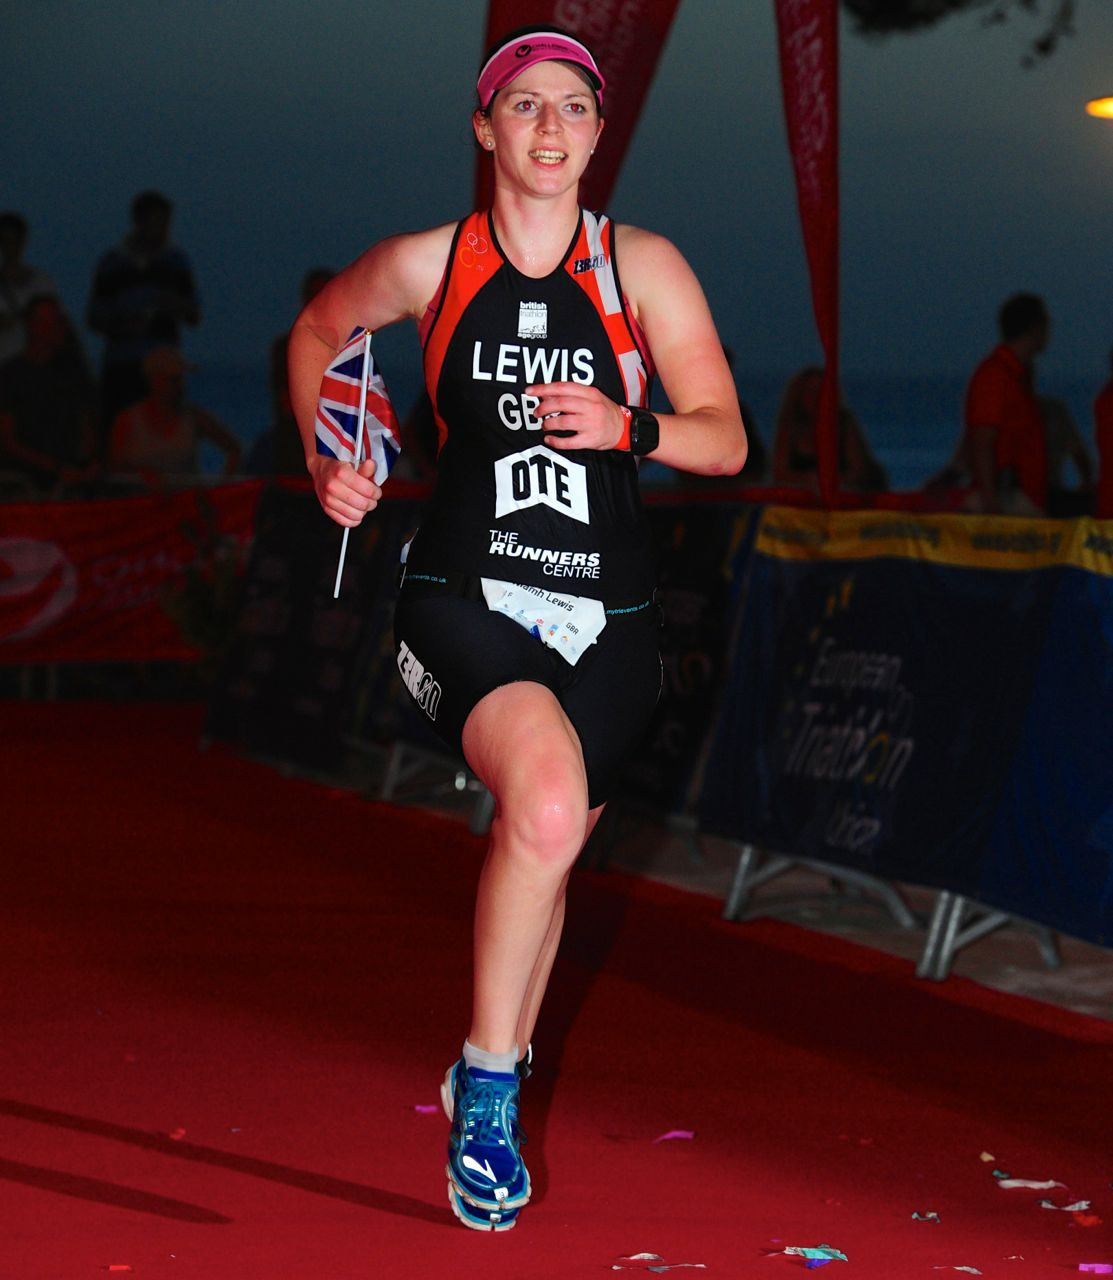 Niamh Lewis on the run at Challenge Paguera-Mallorca 2014